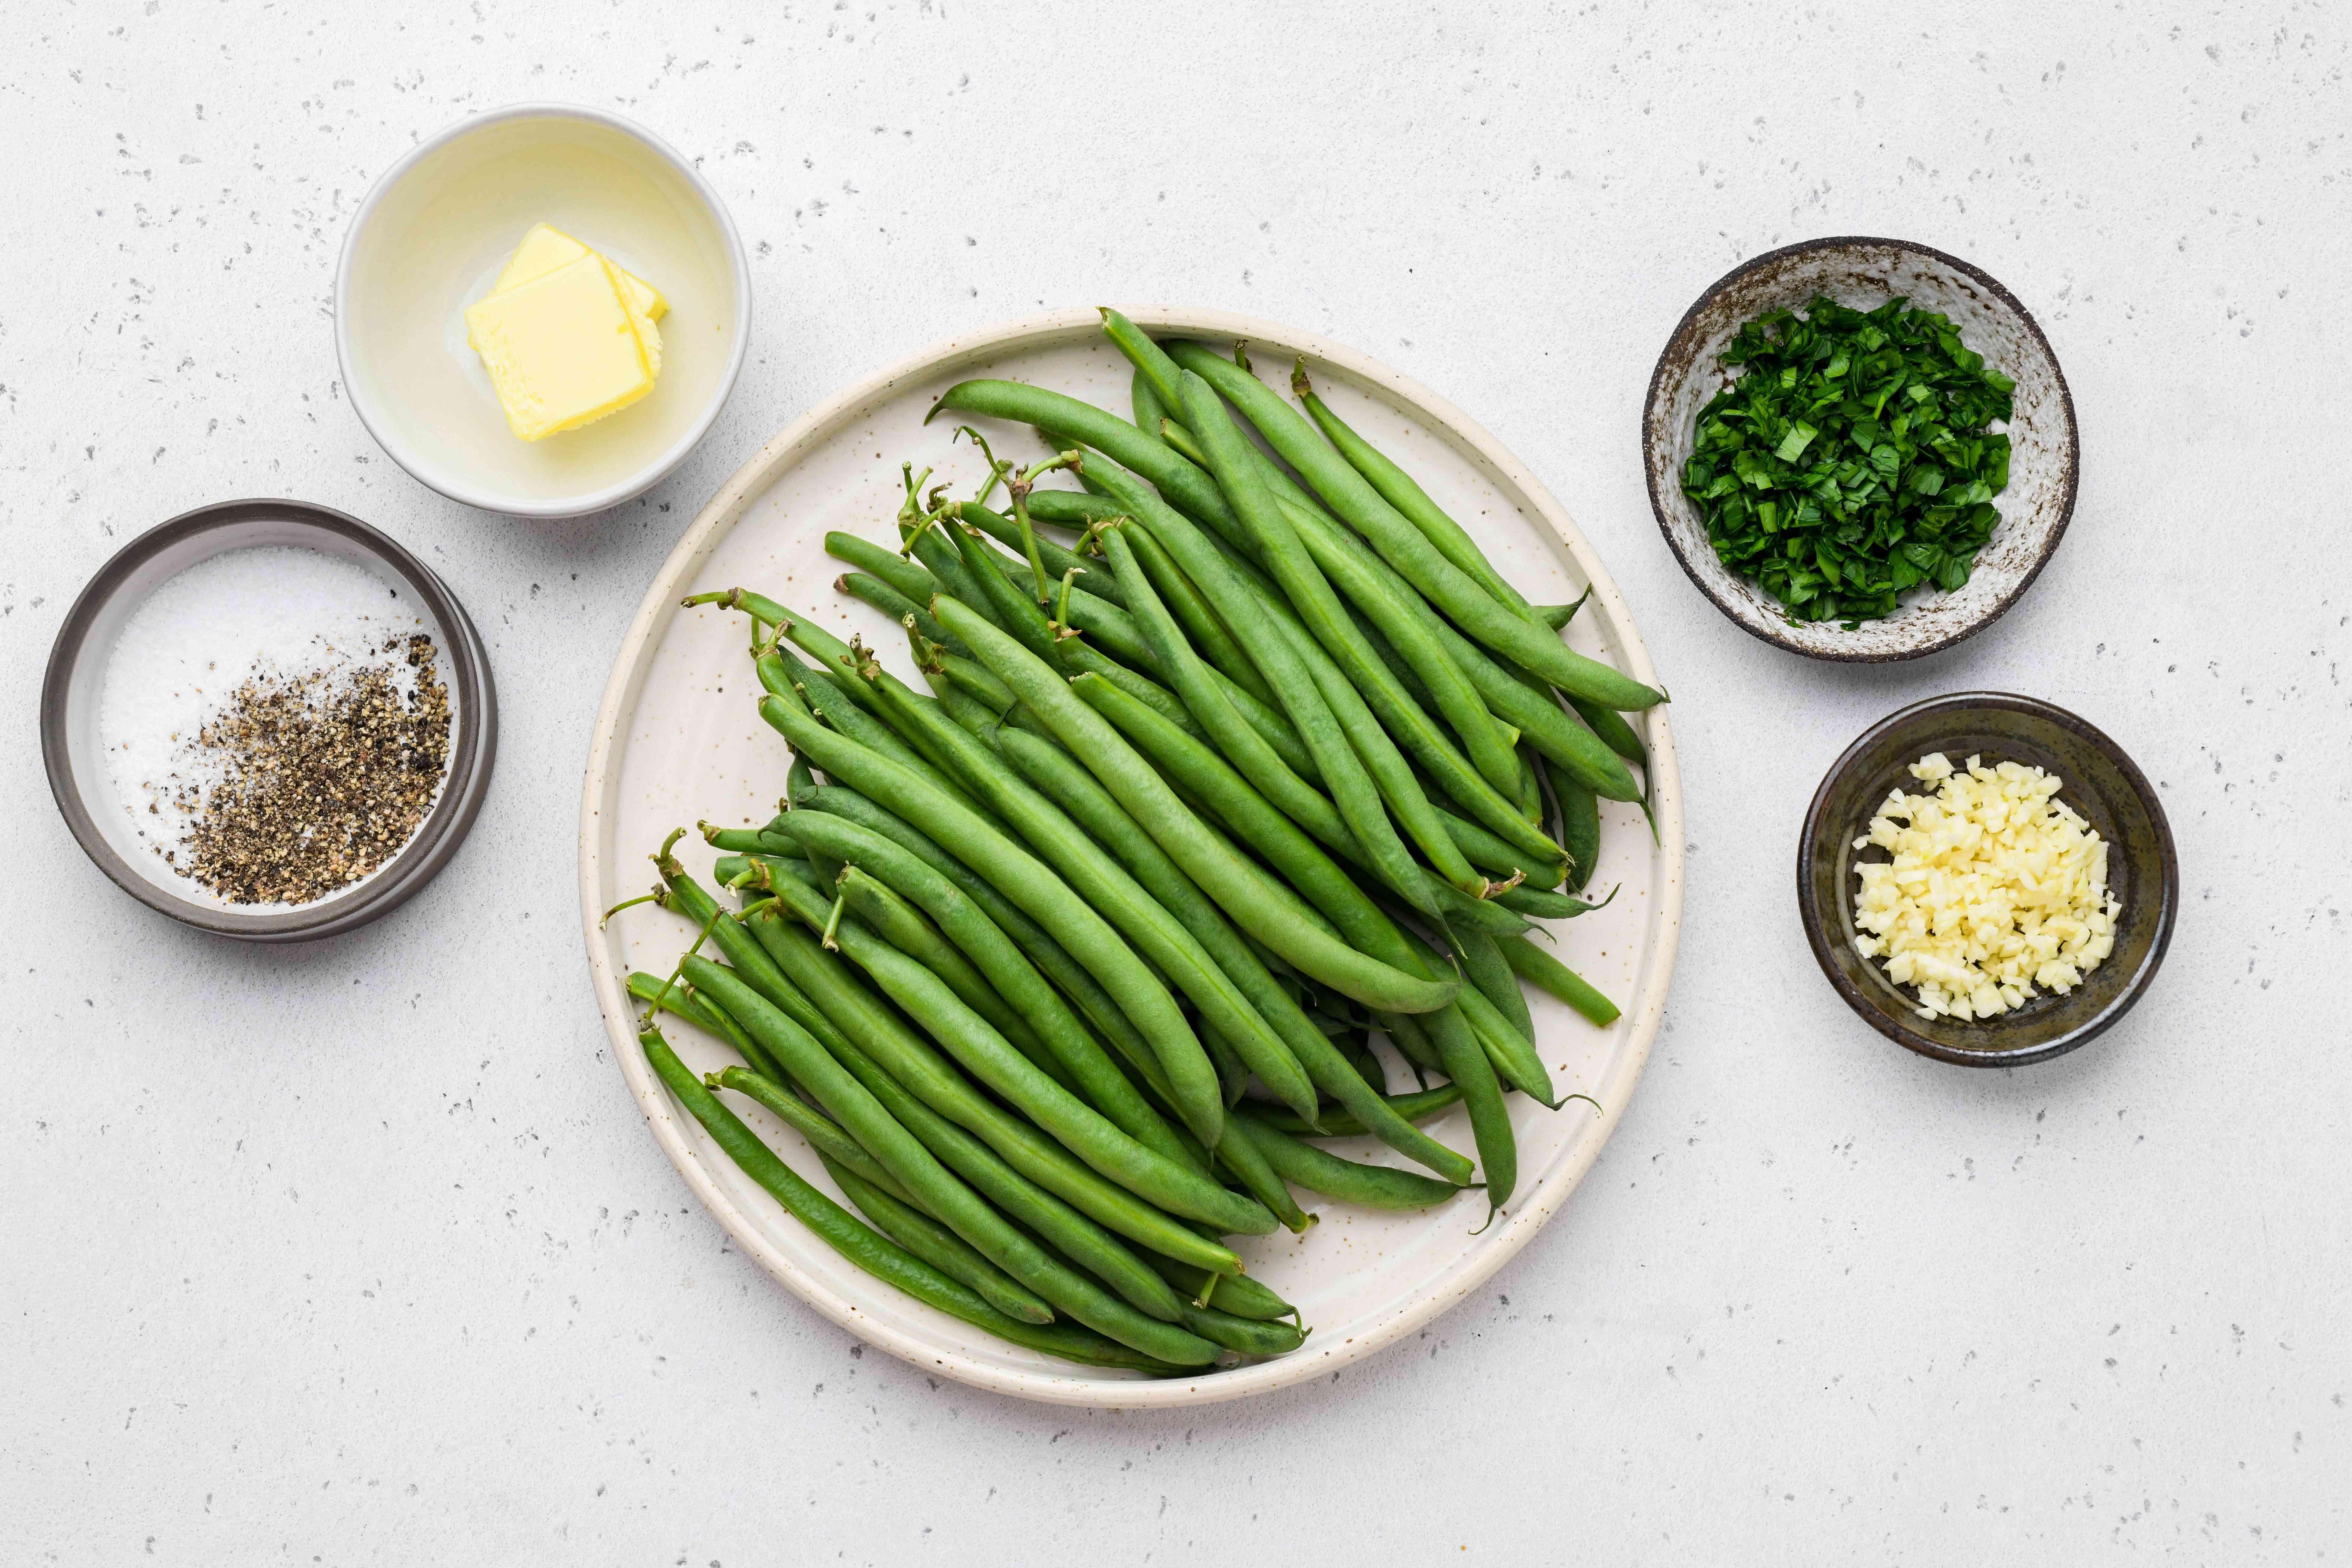 Easy Garlic Green Beans ingredients